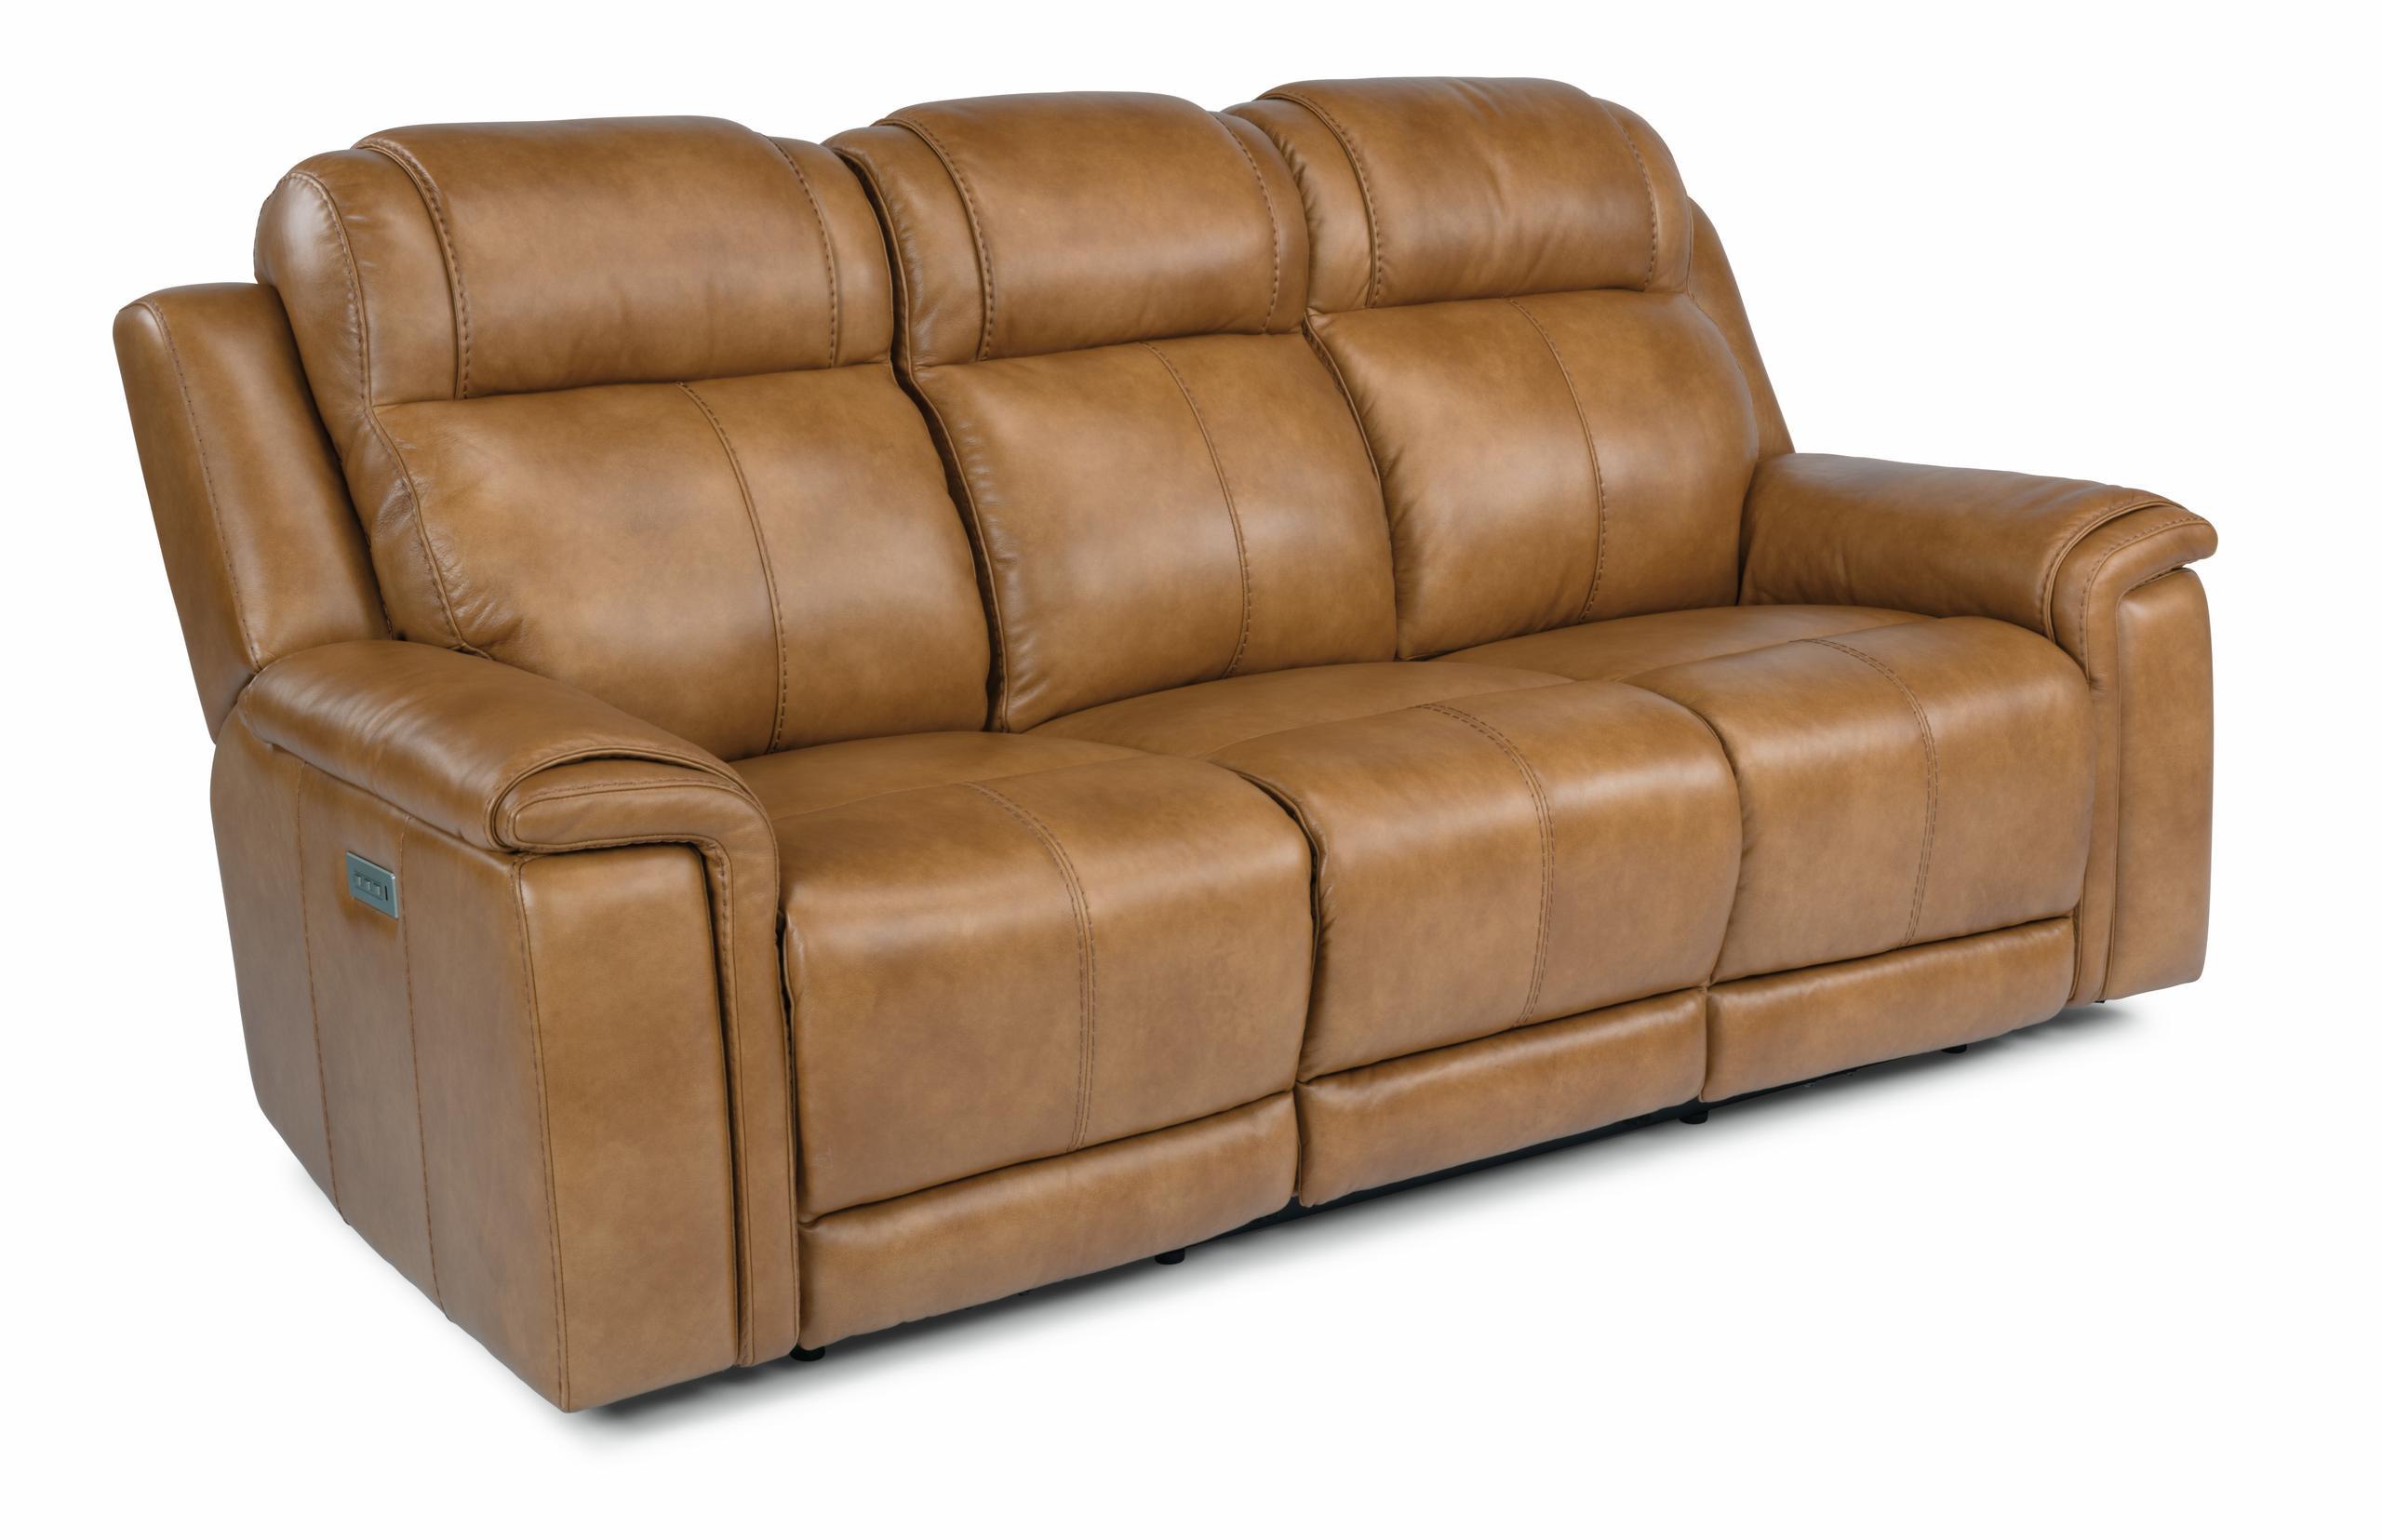 FlexsteelKingsley Power Reclining Sofa With Power Headrests And Lumbar